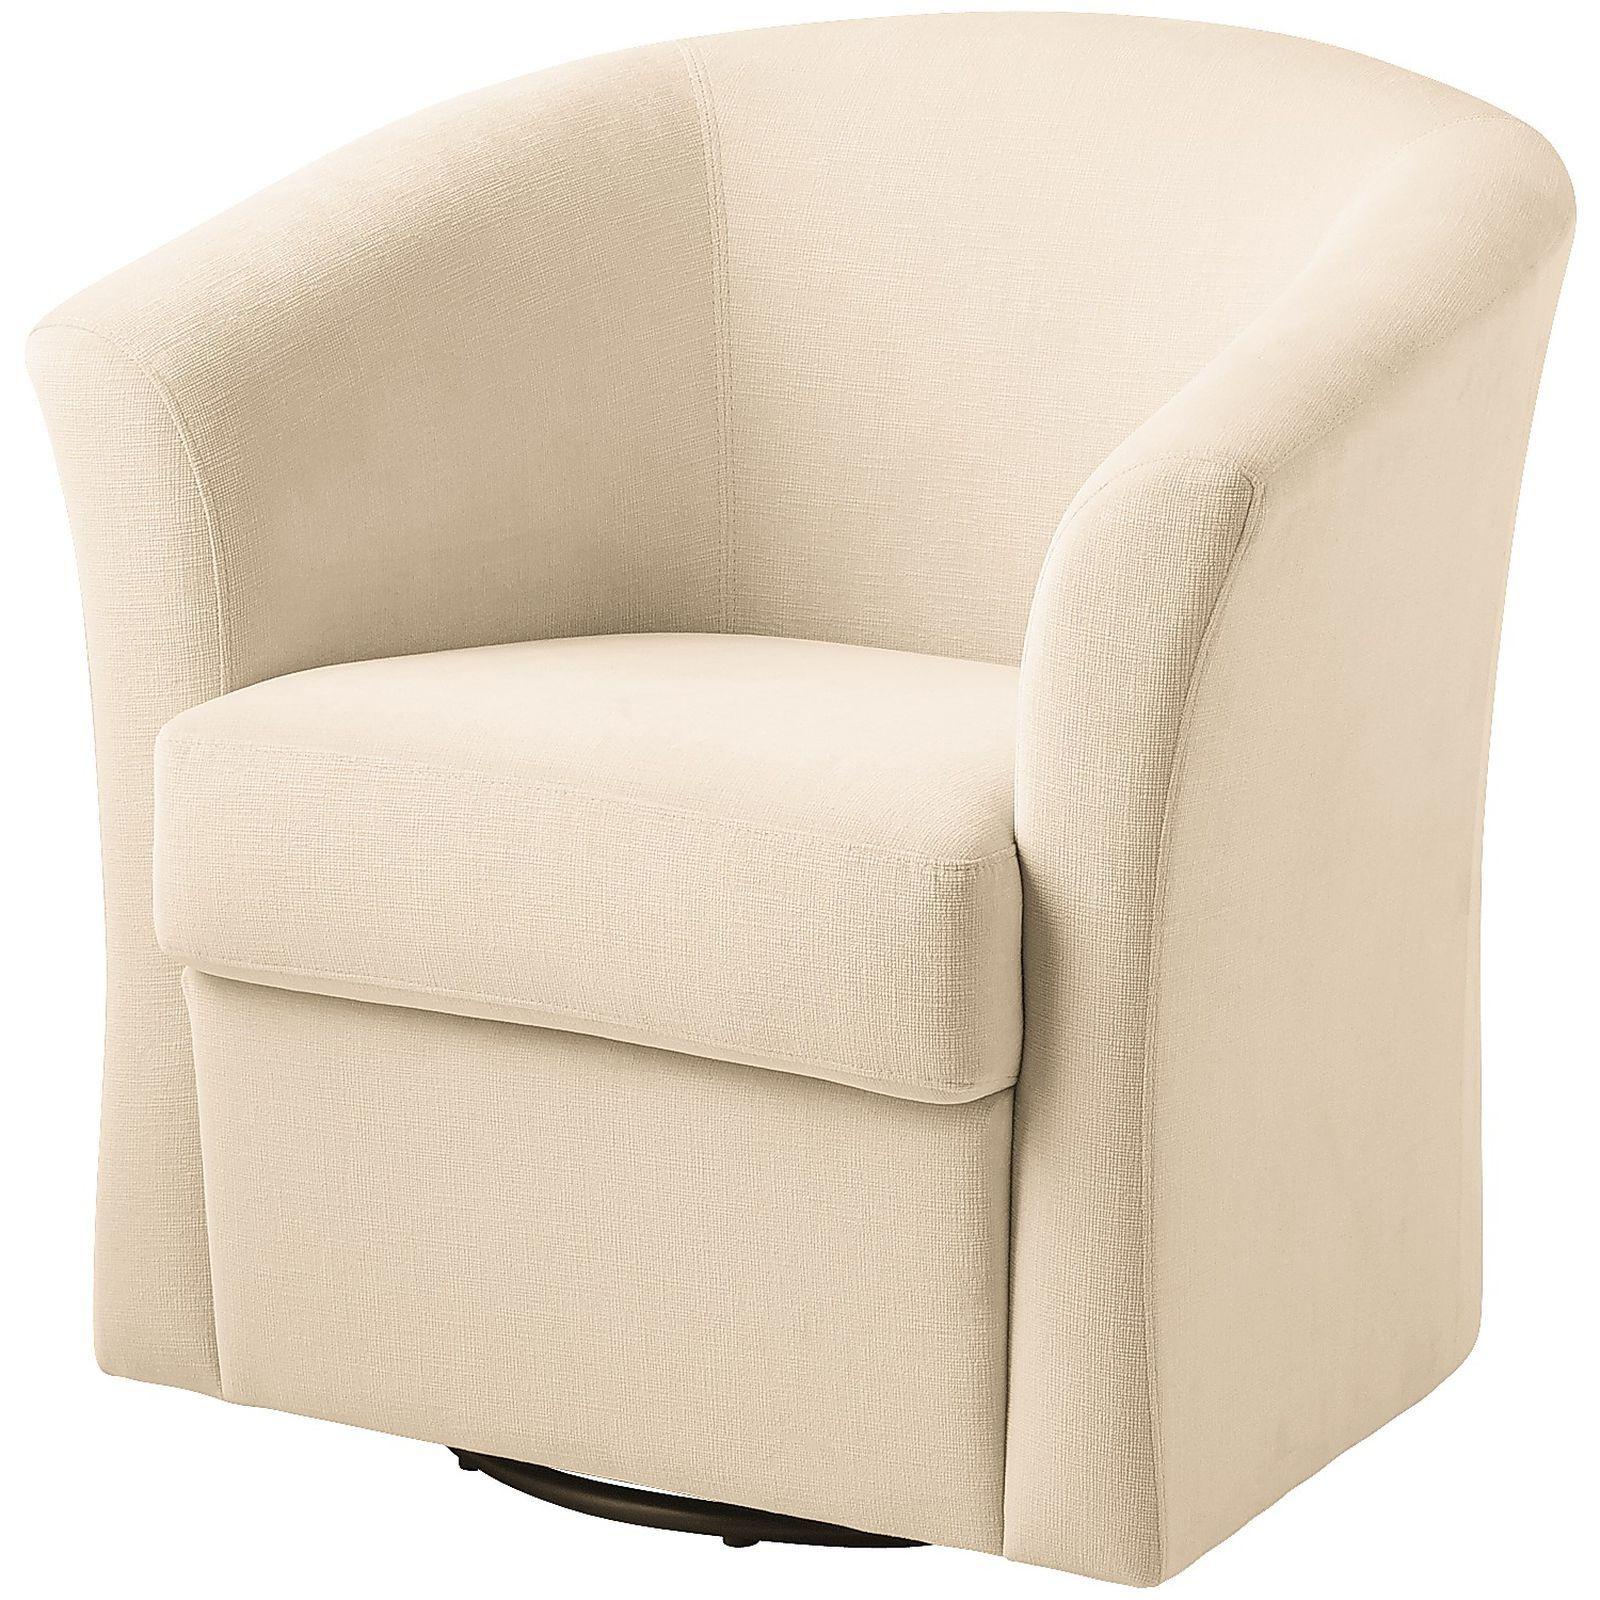 Twirl Swivel Accent Chairs